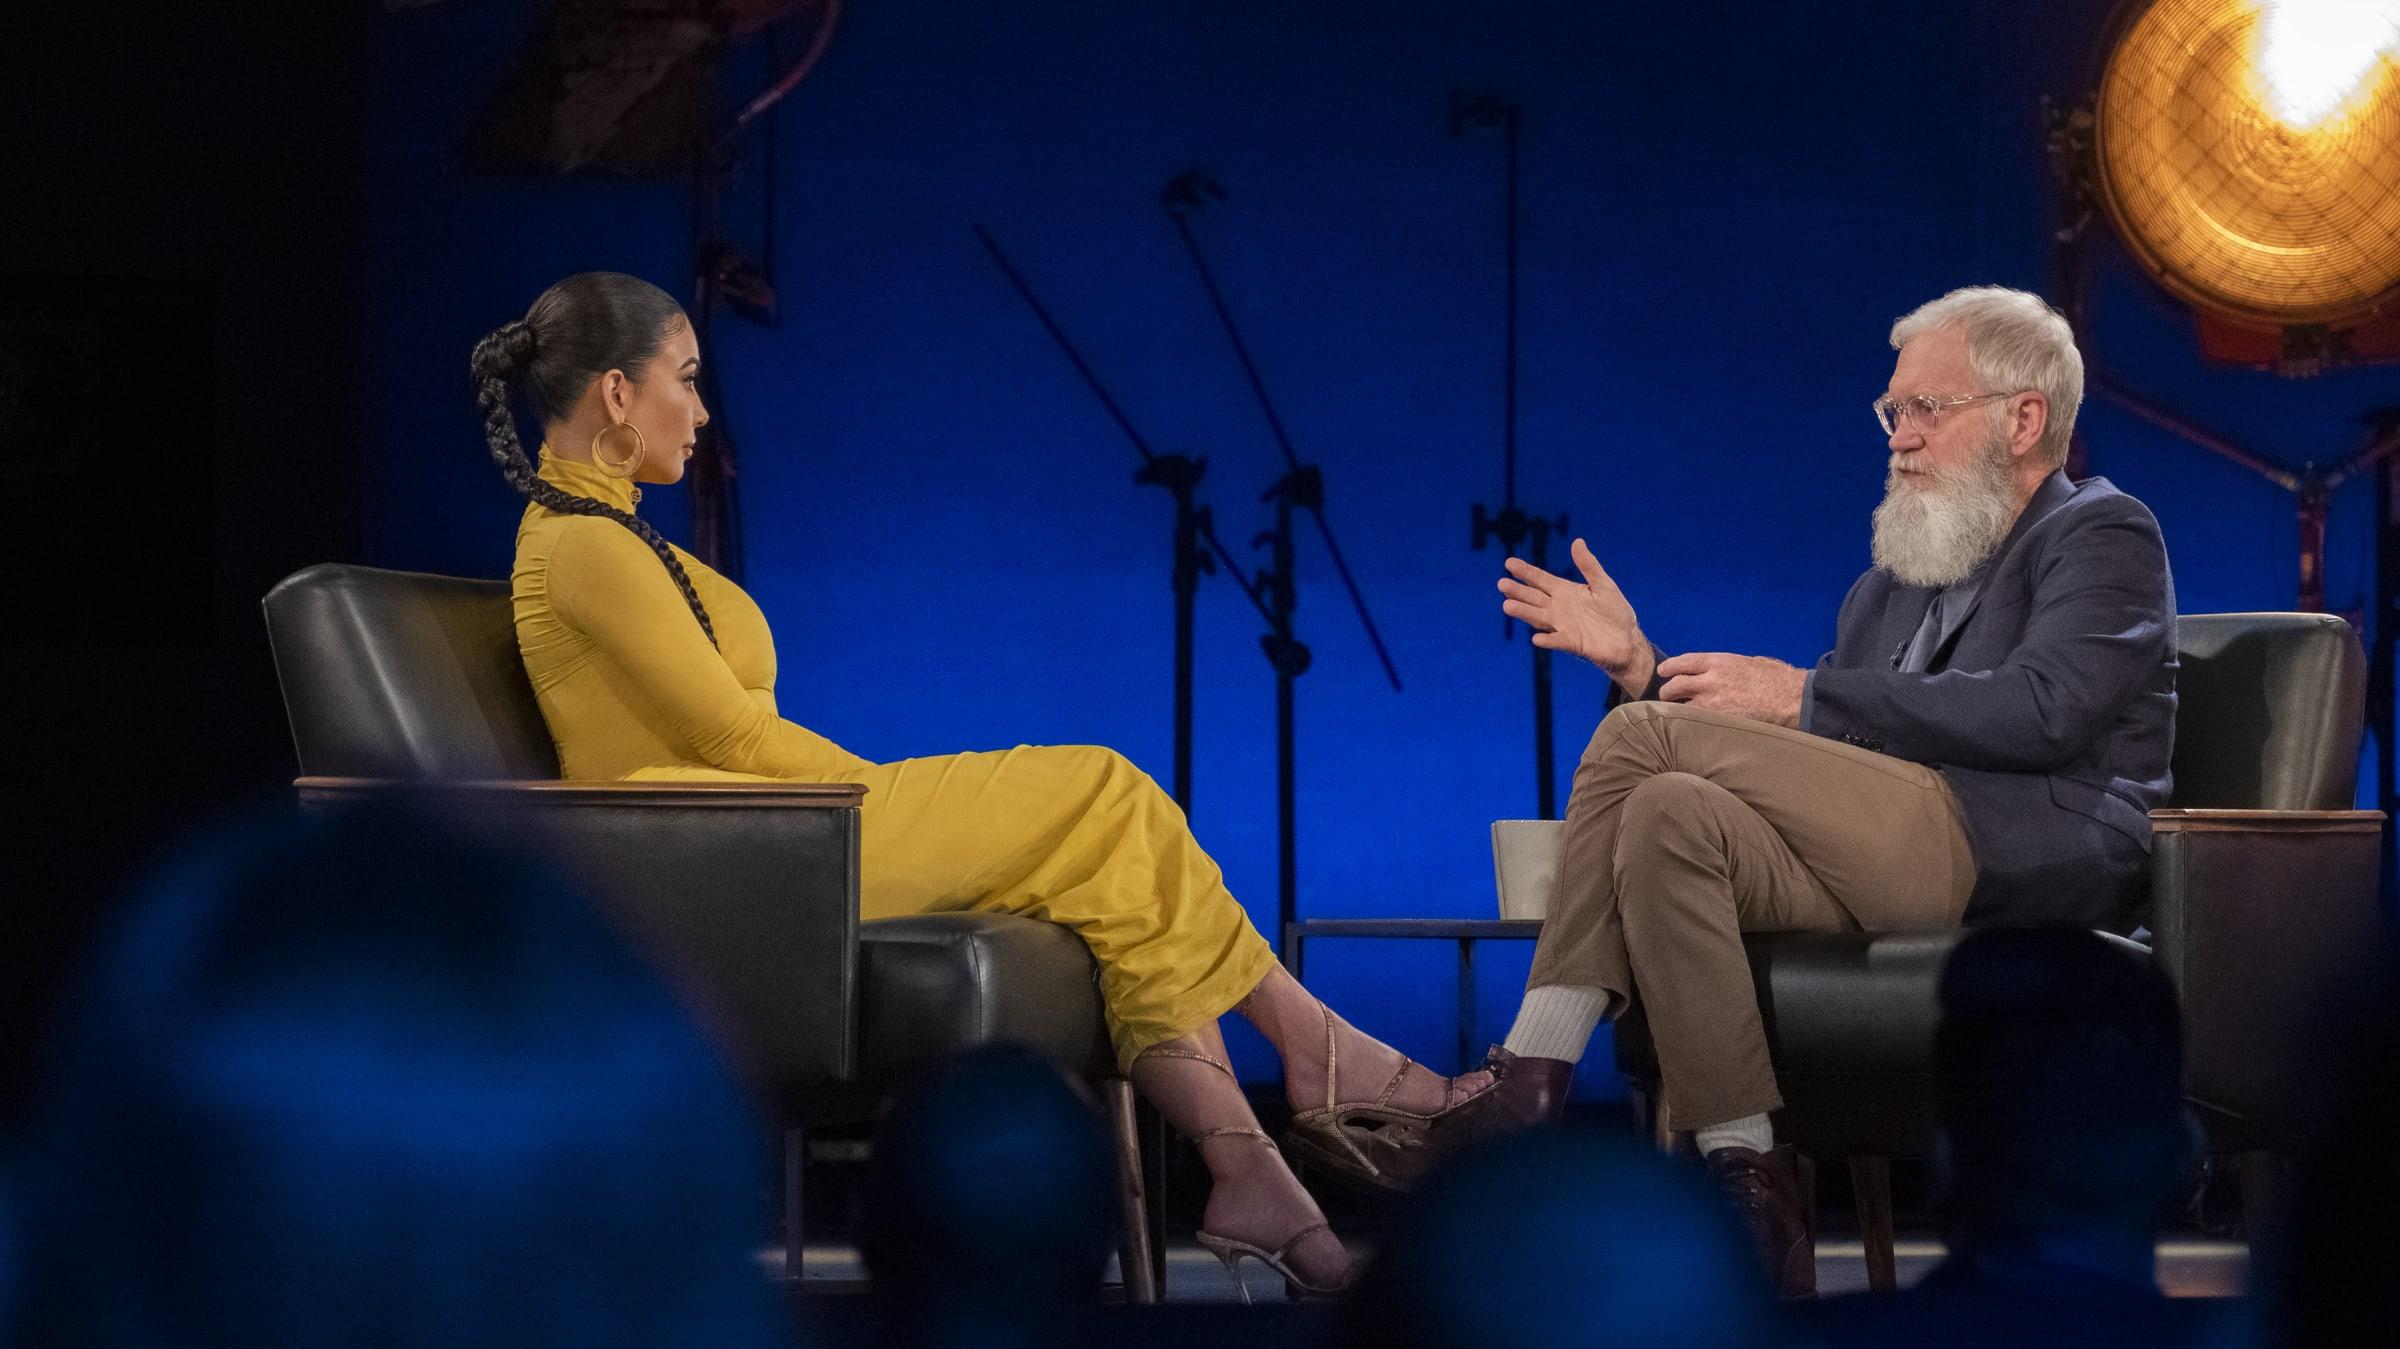 Kim Kardashian & David Letterman